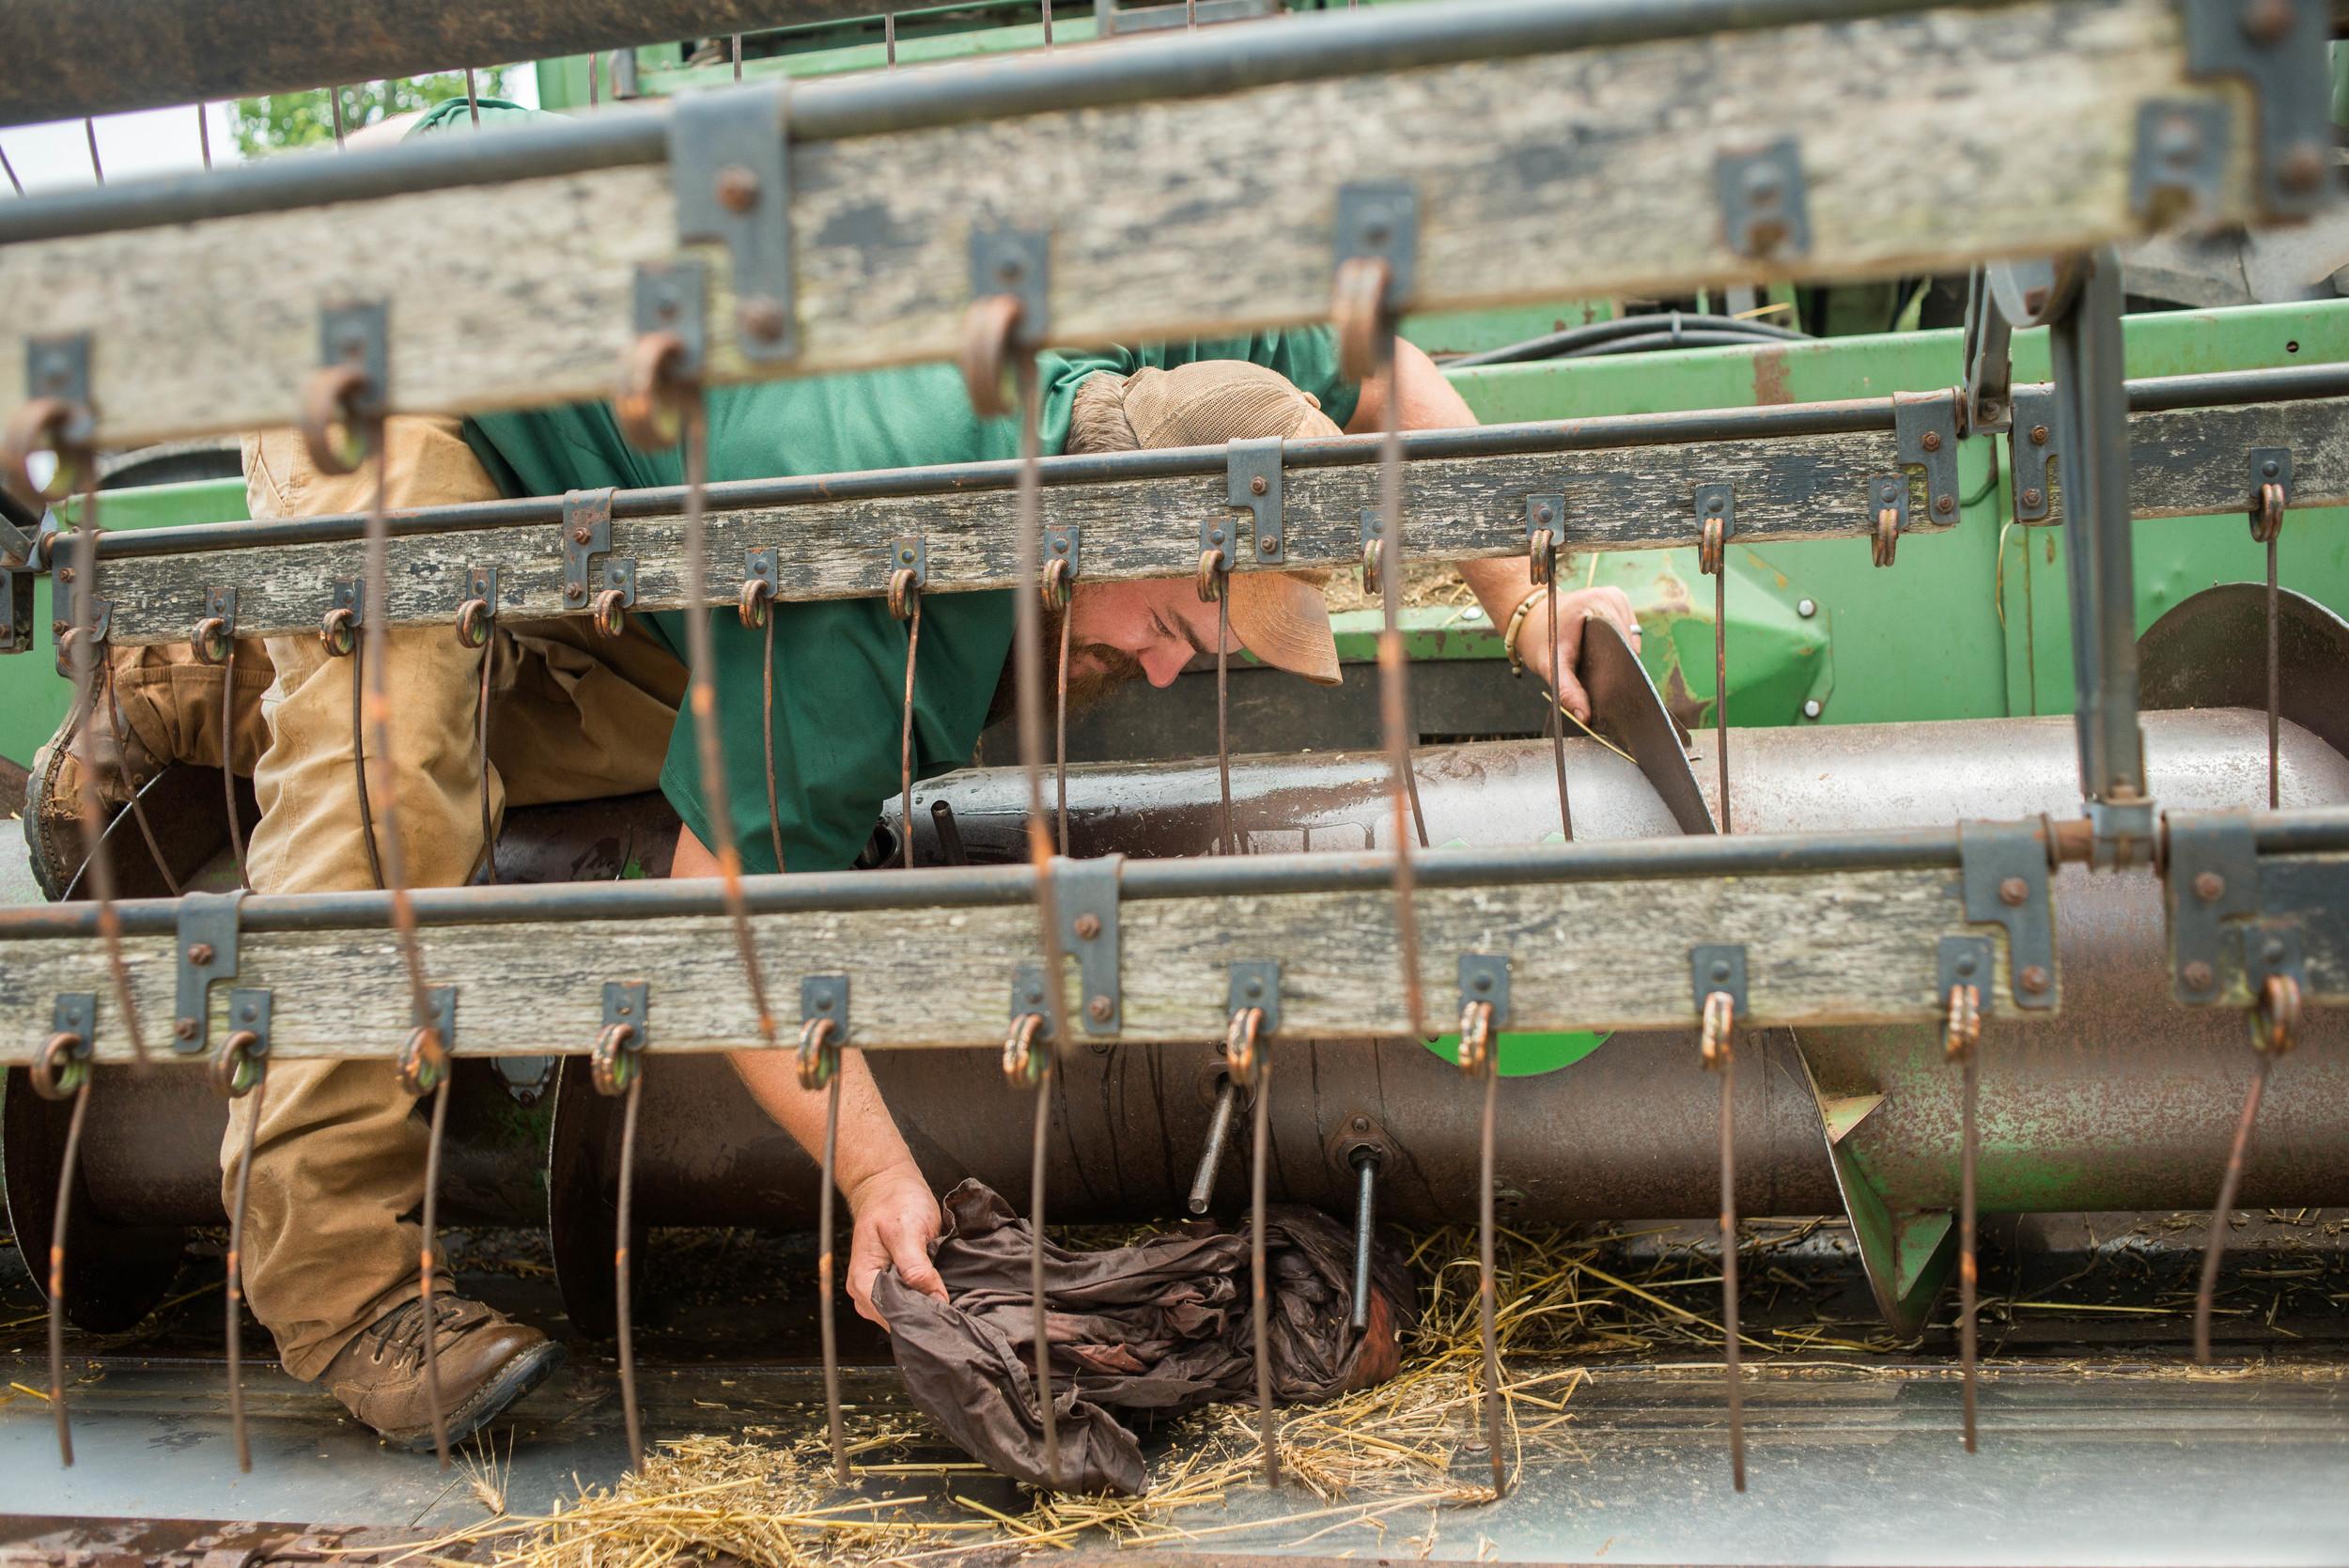 080215 farmer 12 AJG.jpg